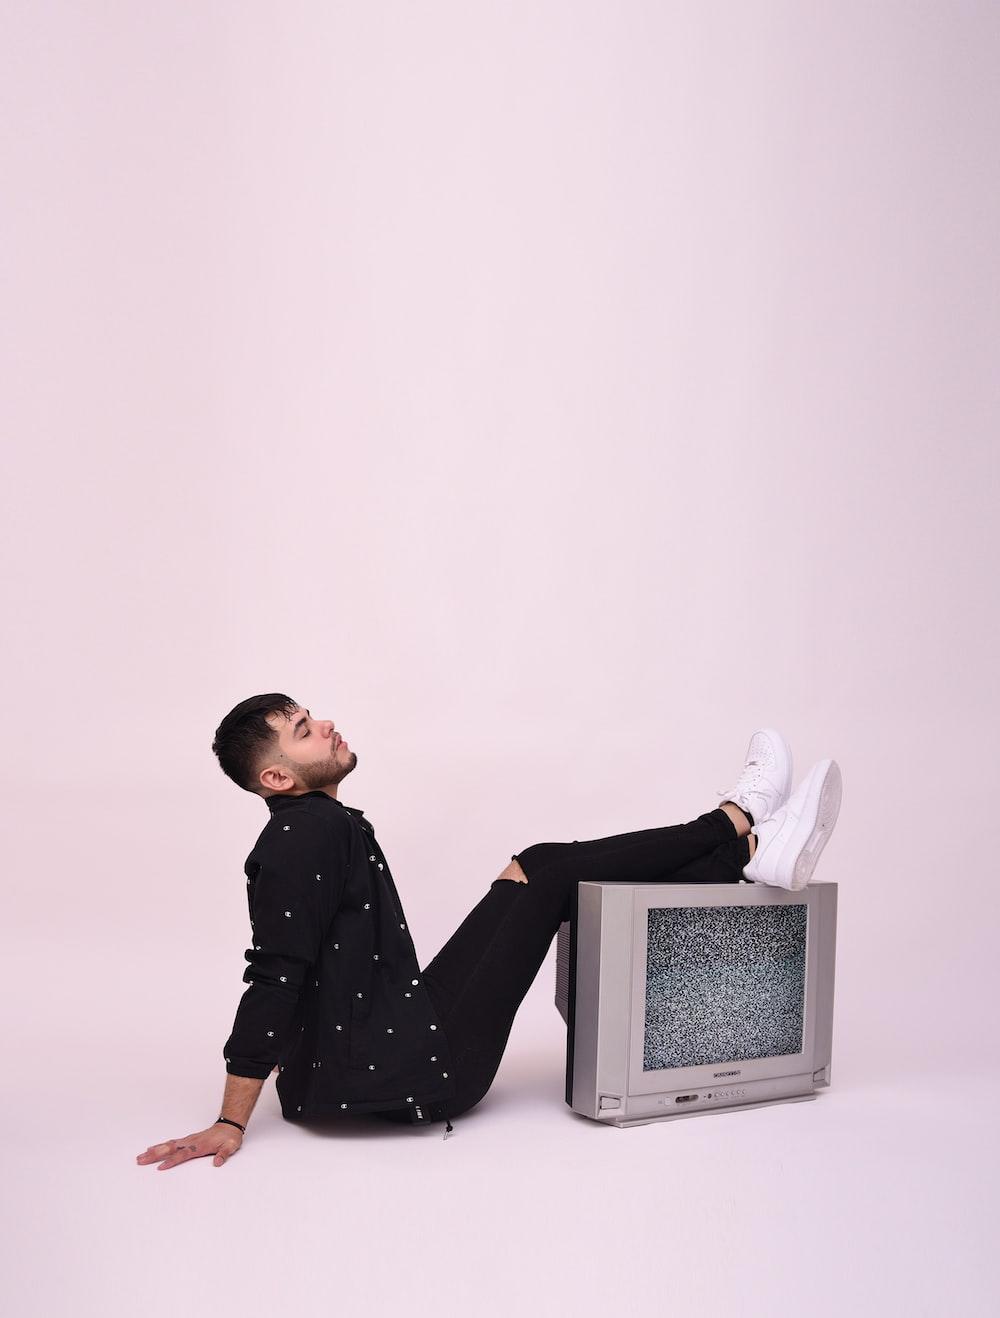 boy in black and white polka dot long sleeve shirt sitting on white chair